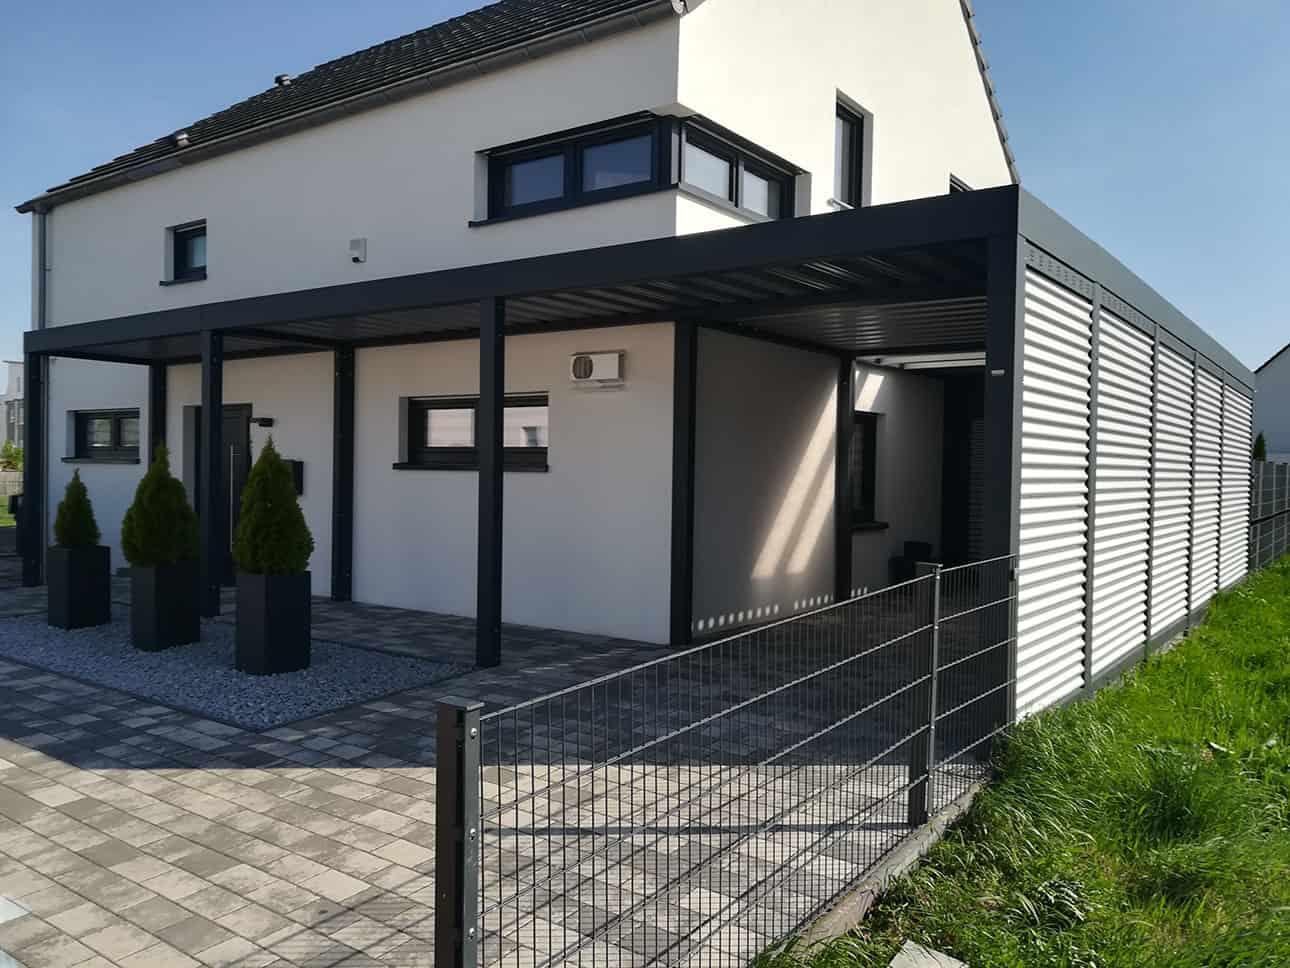 Stahl Carports - comodul Nordheide